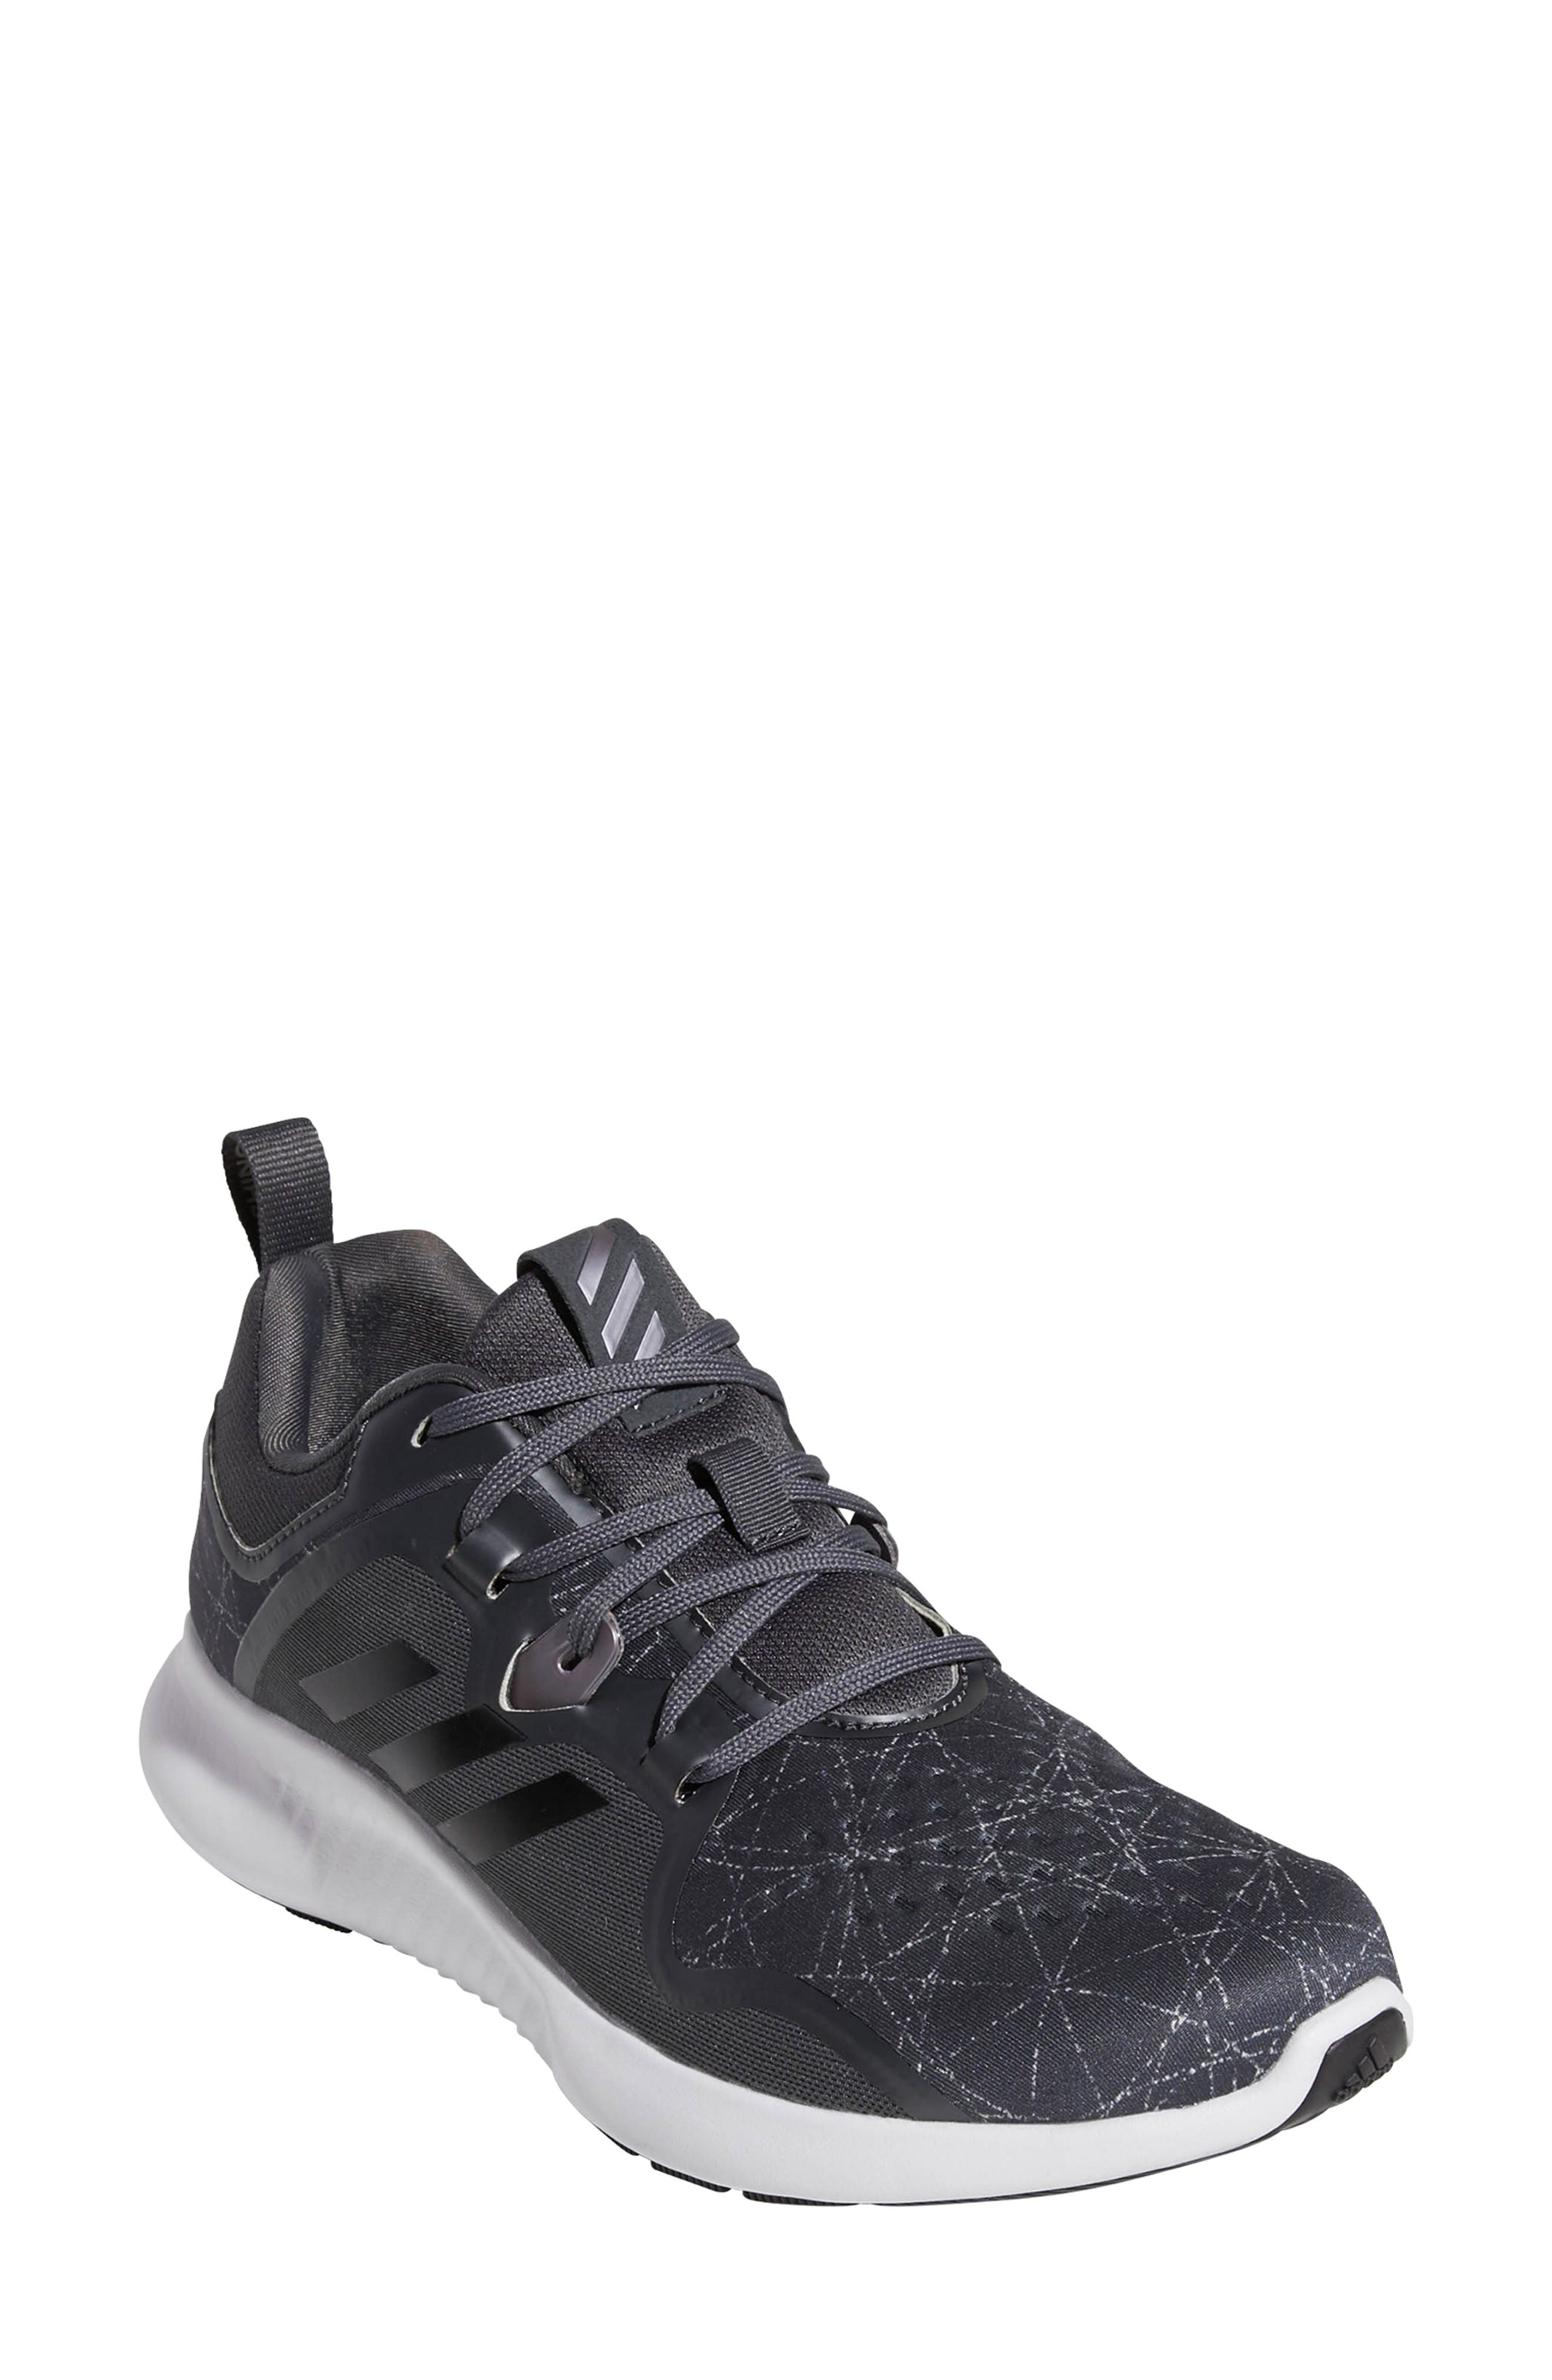 Adidas Edgebounce Running Shoe- Grey